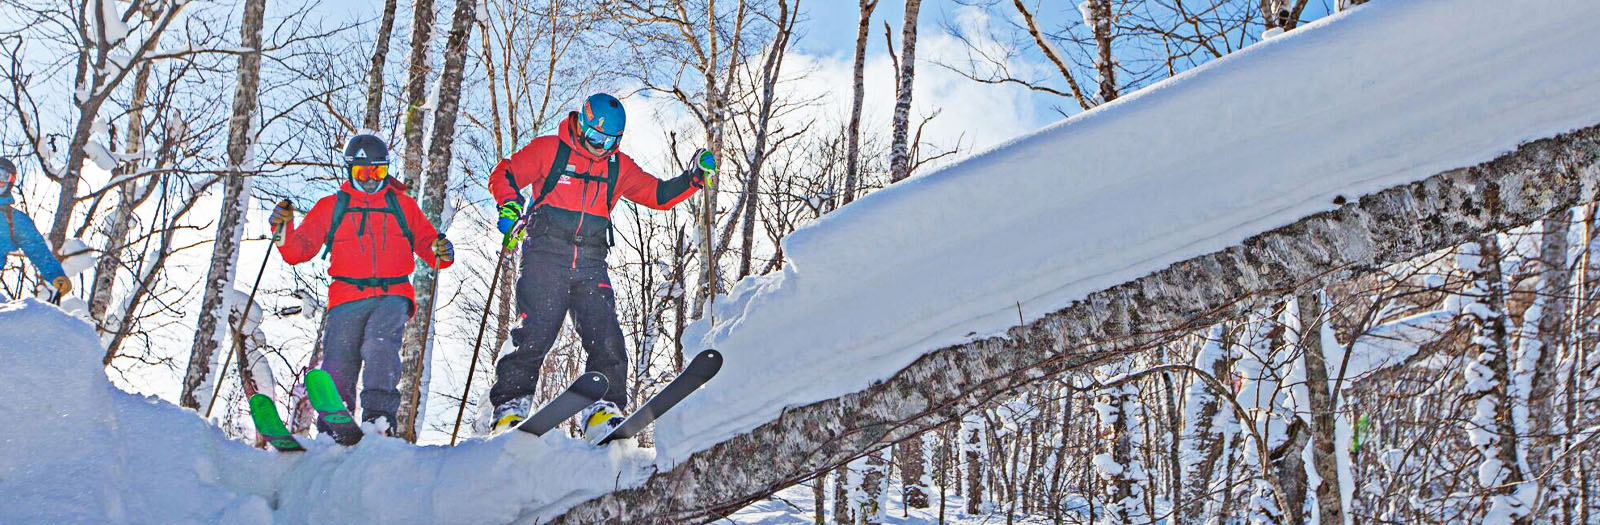 first time ski trip japan, guided ski japan, backcountry powder trip japan